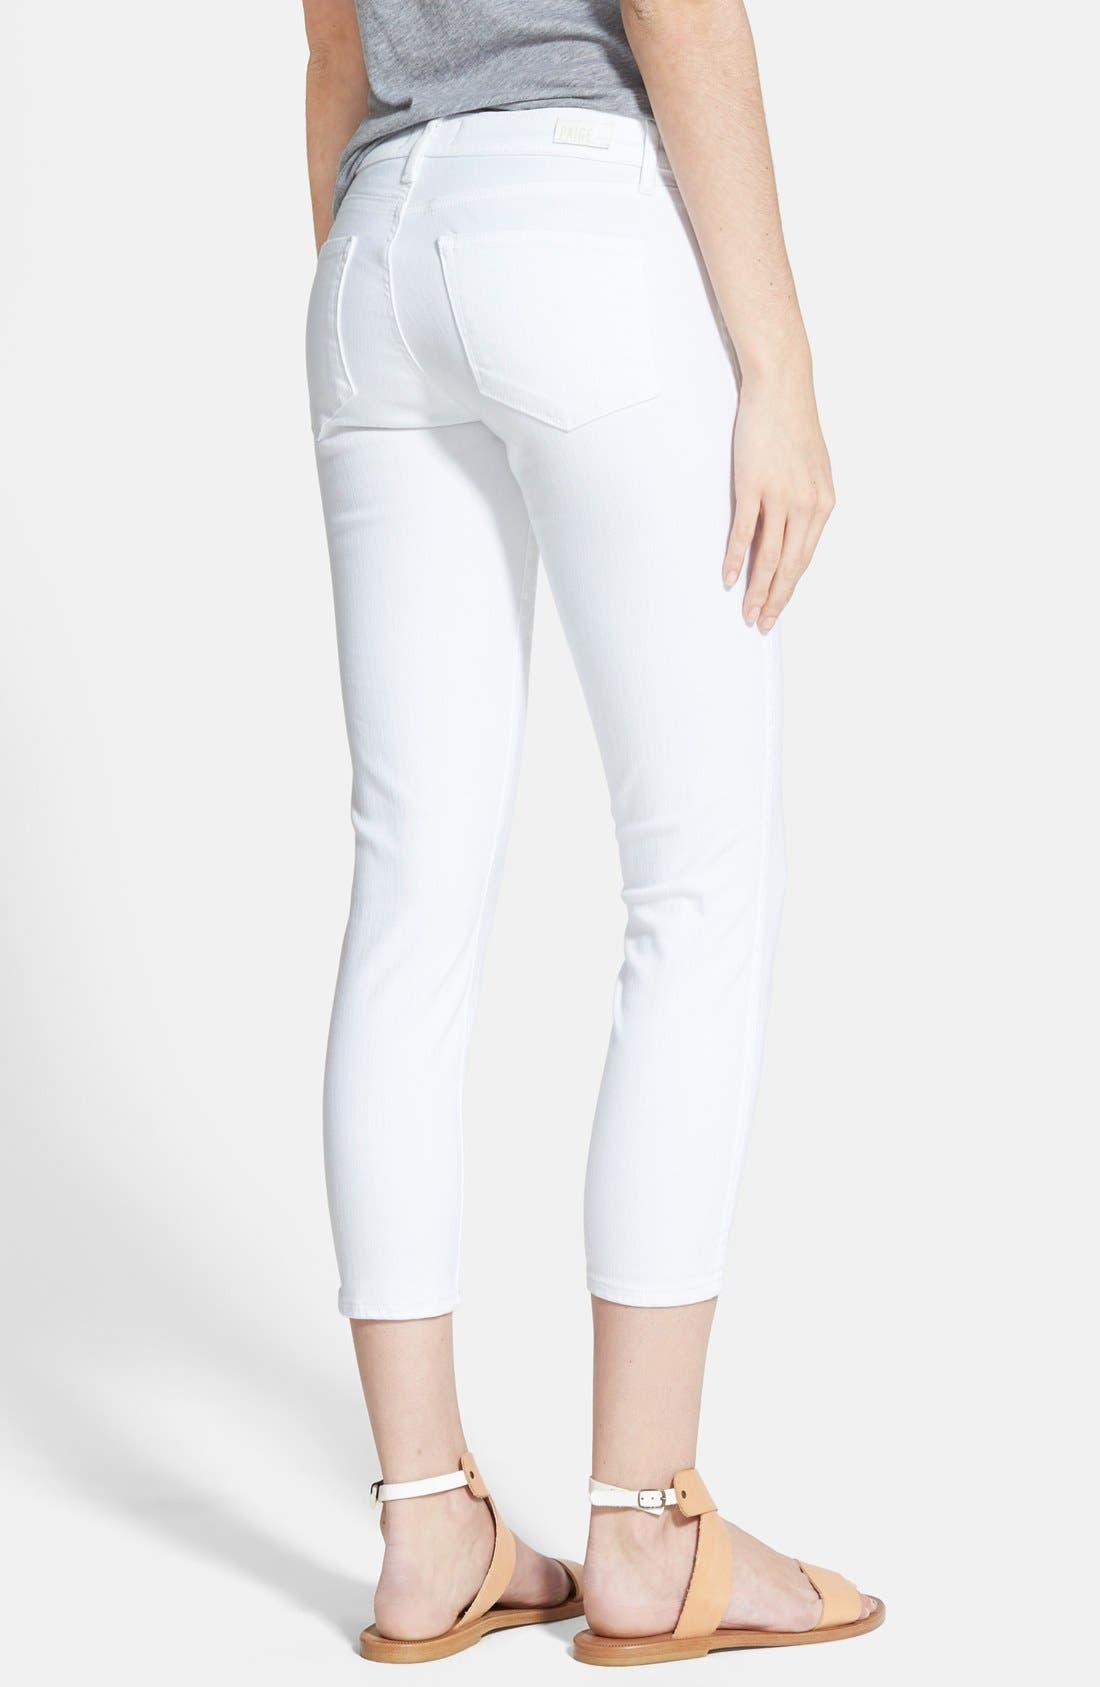 'Verdugo' Crop Skinny Jeans,                             Alternate thumbnail 3, color,                             ULTRA WHITE